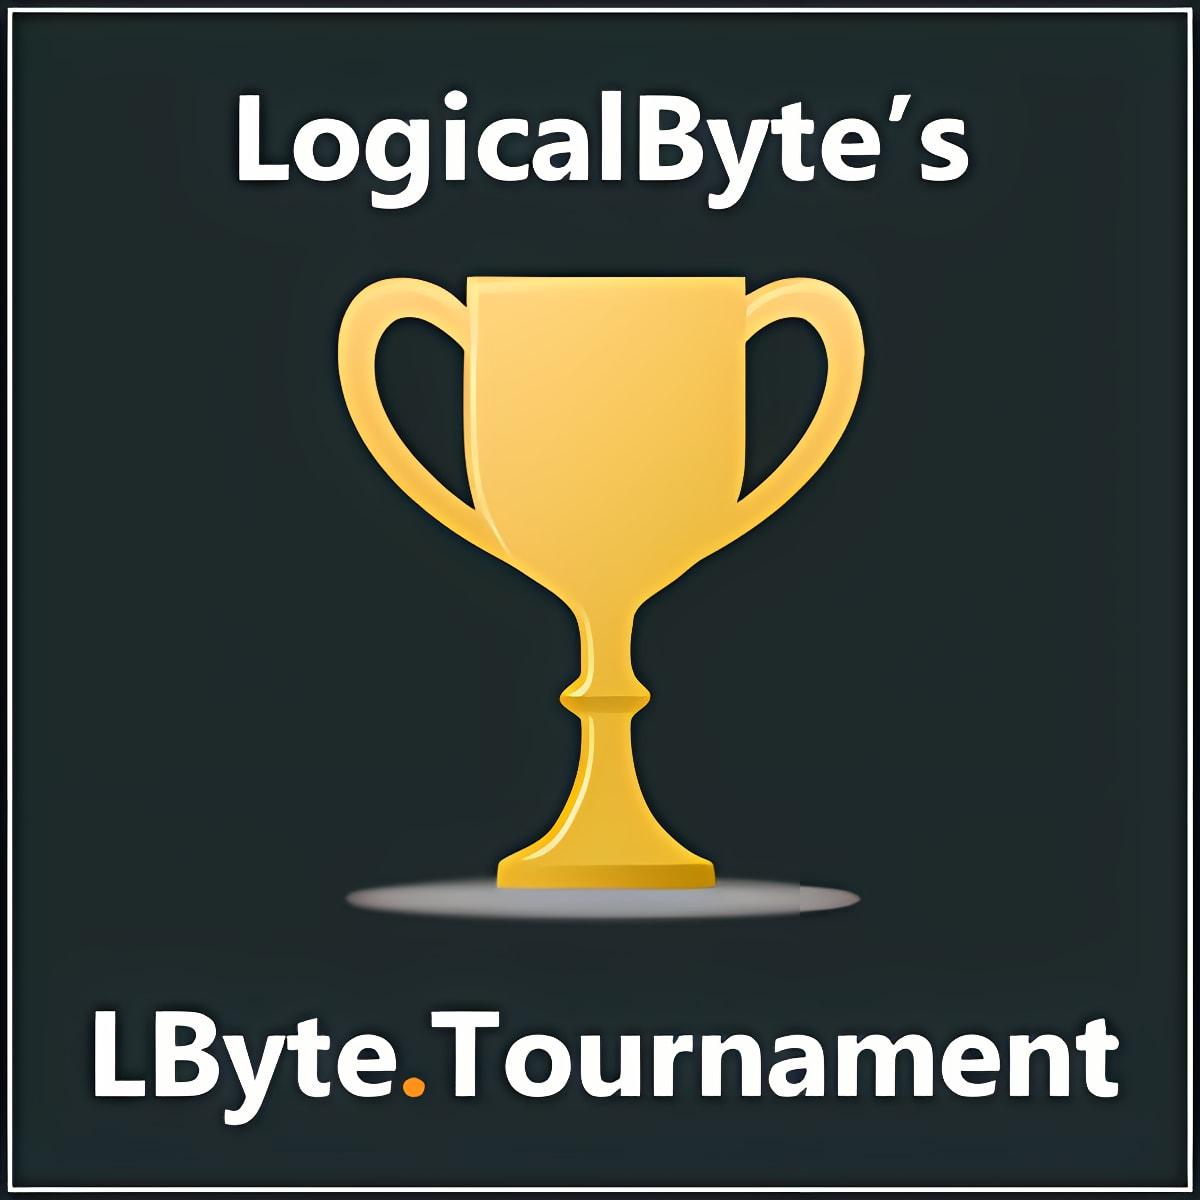 LByte.Tournament